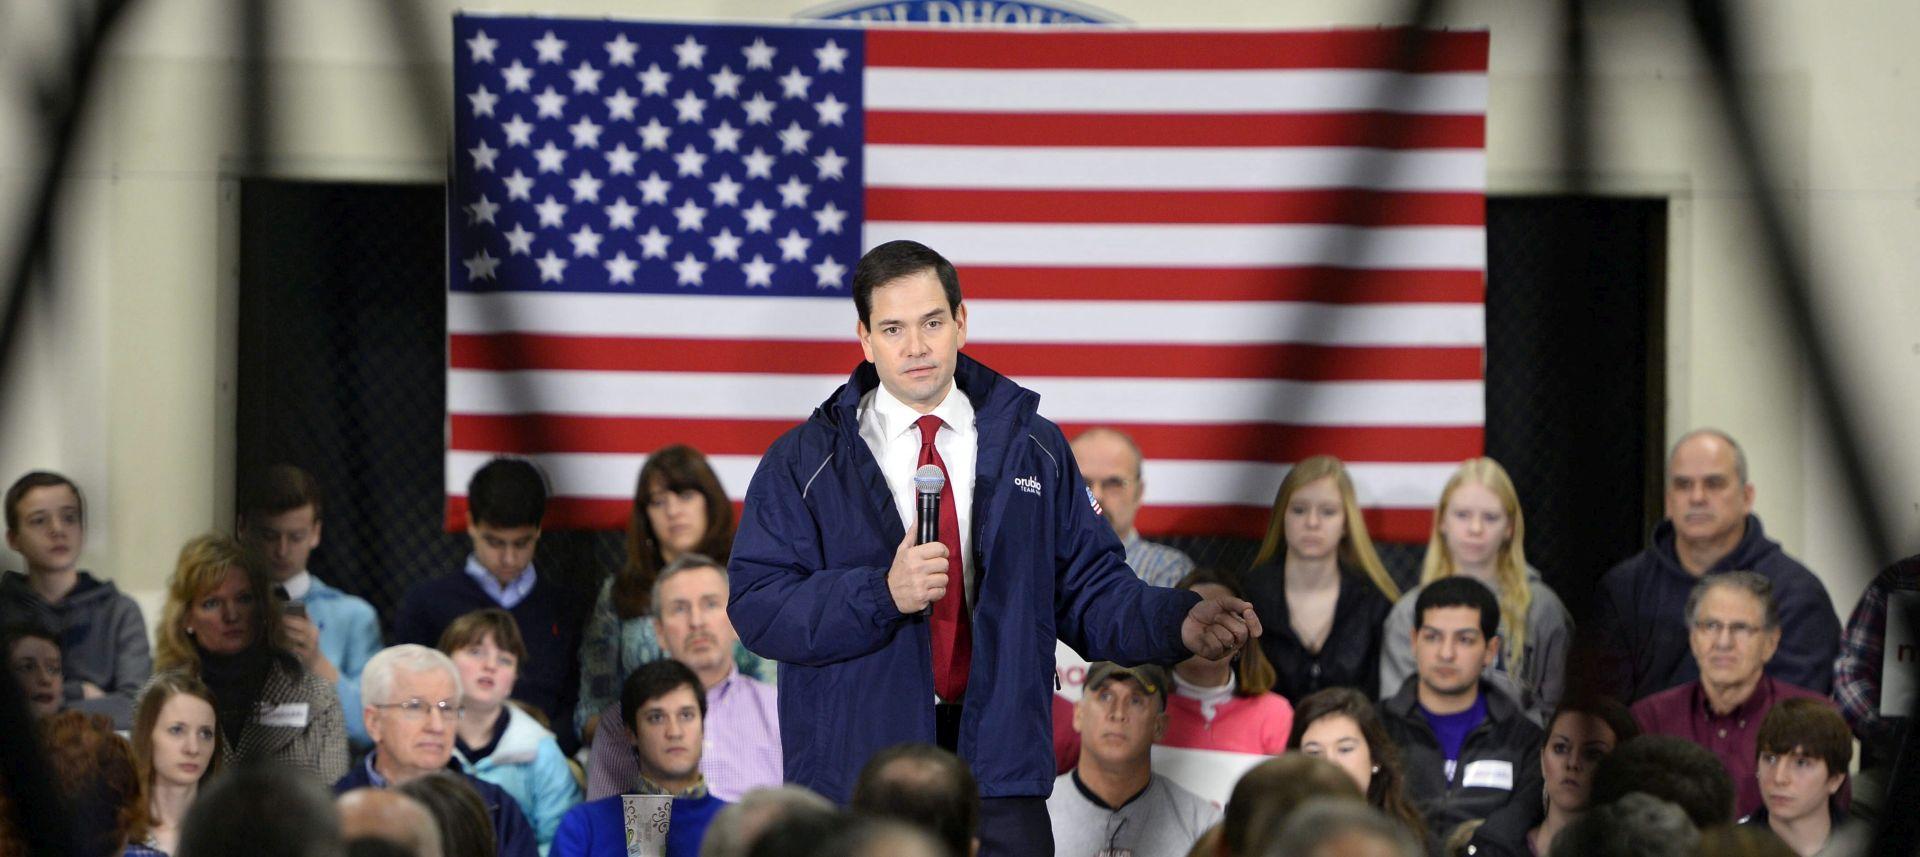 MANJAK ISKUSTVA: Rubio meta velikih kritika u republikanskoj debati